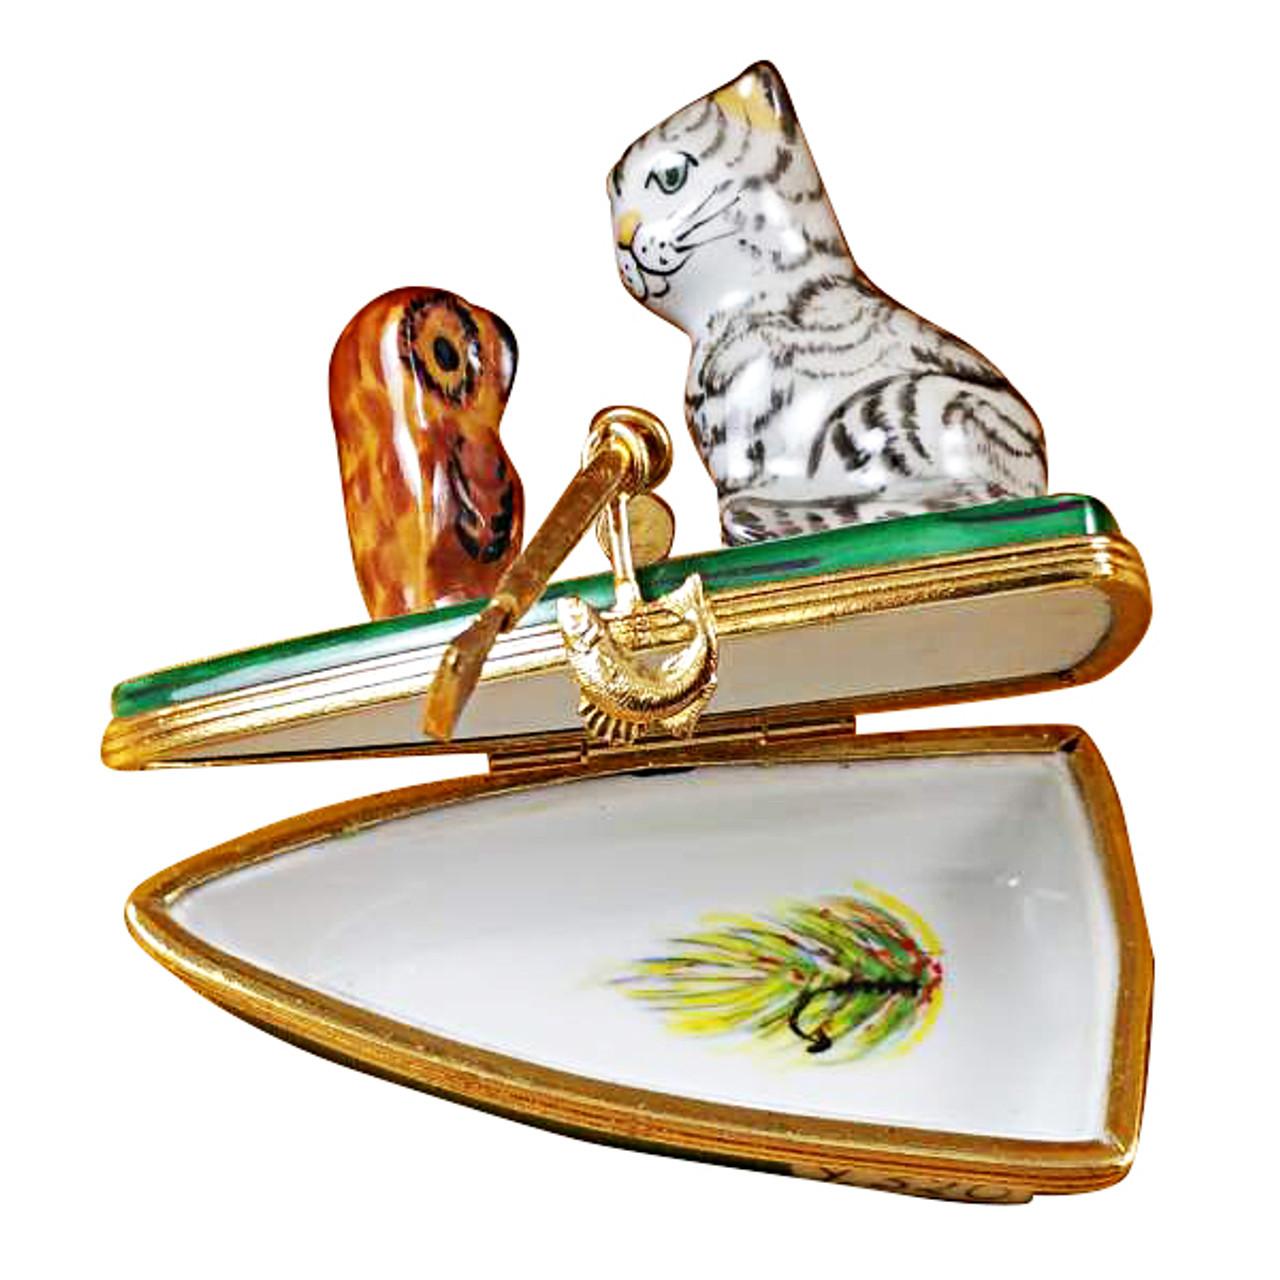 Limoges Imports Owl & Pussycat Limoges Box